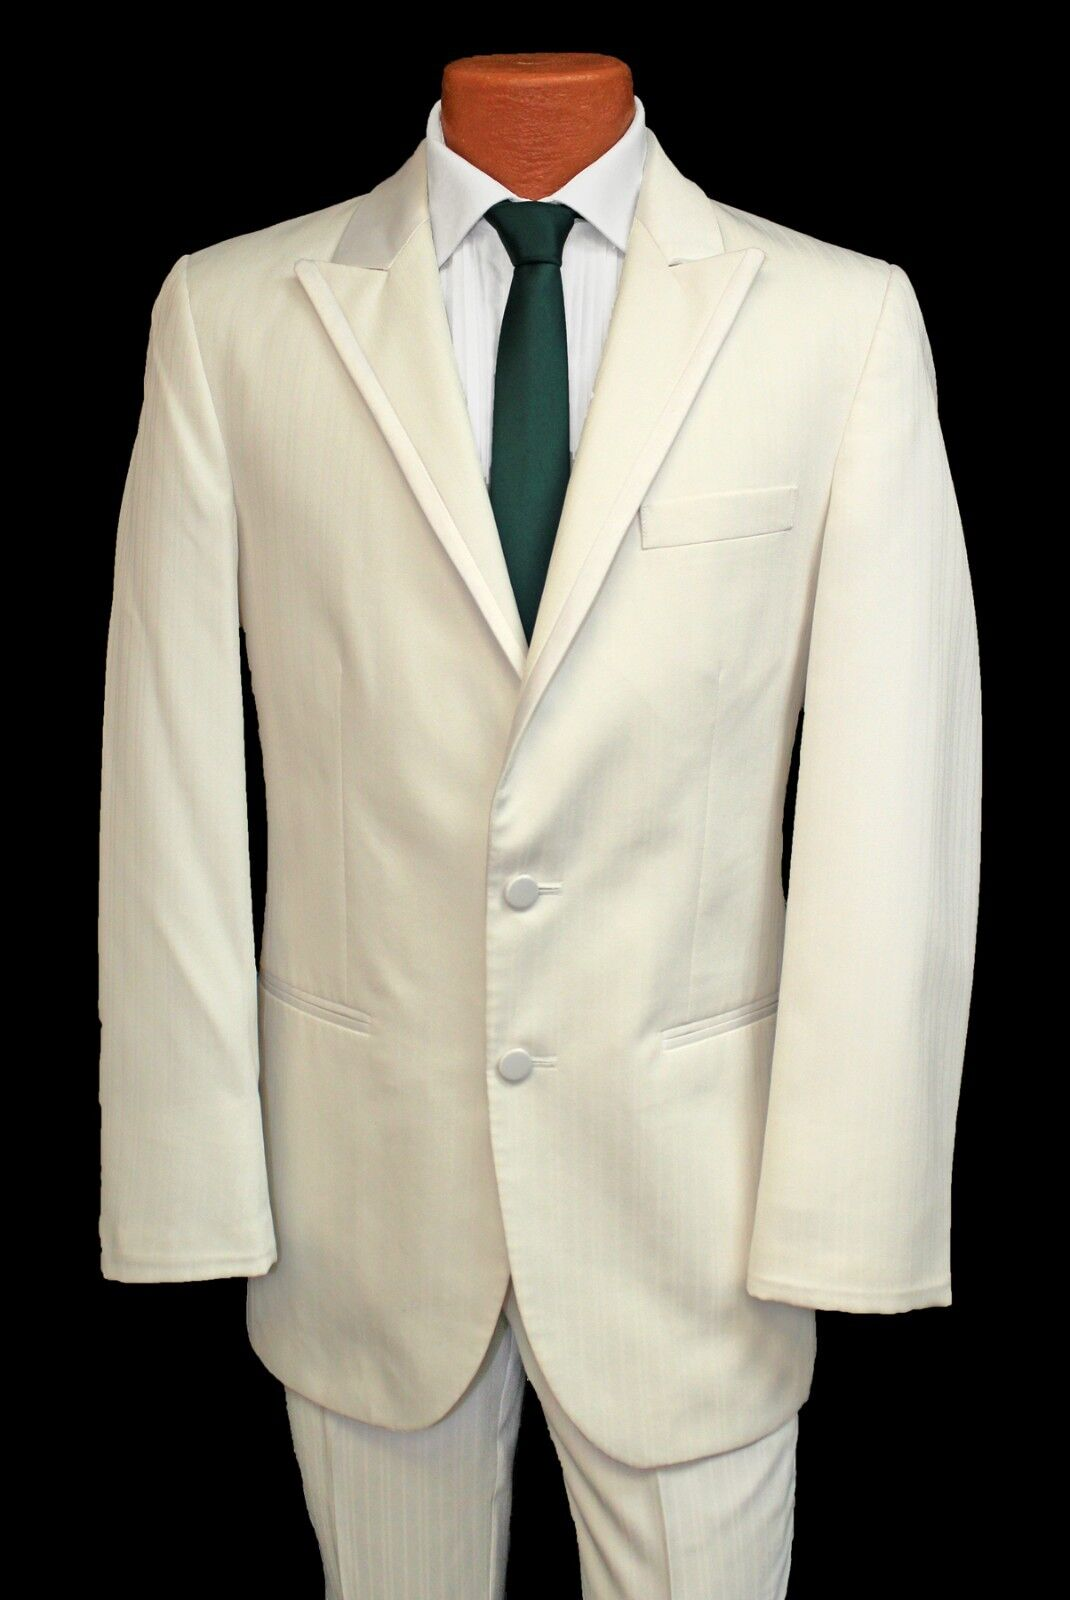 39L Diamond White Cream Parisian Prom Tuxedo Suit Blazer & Trouser Set Ivory